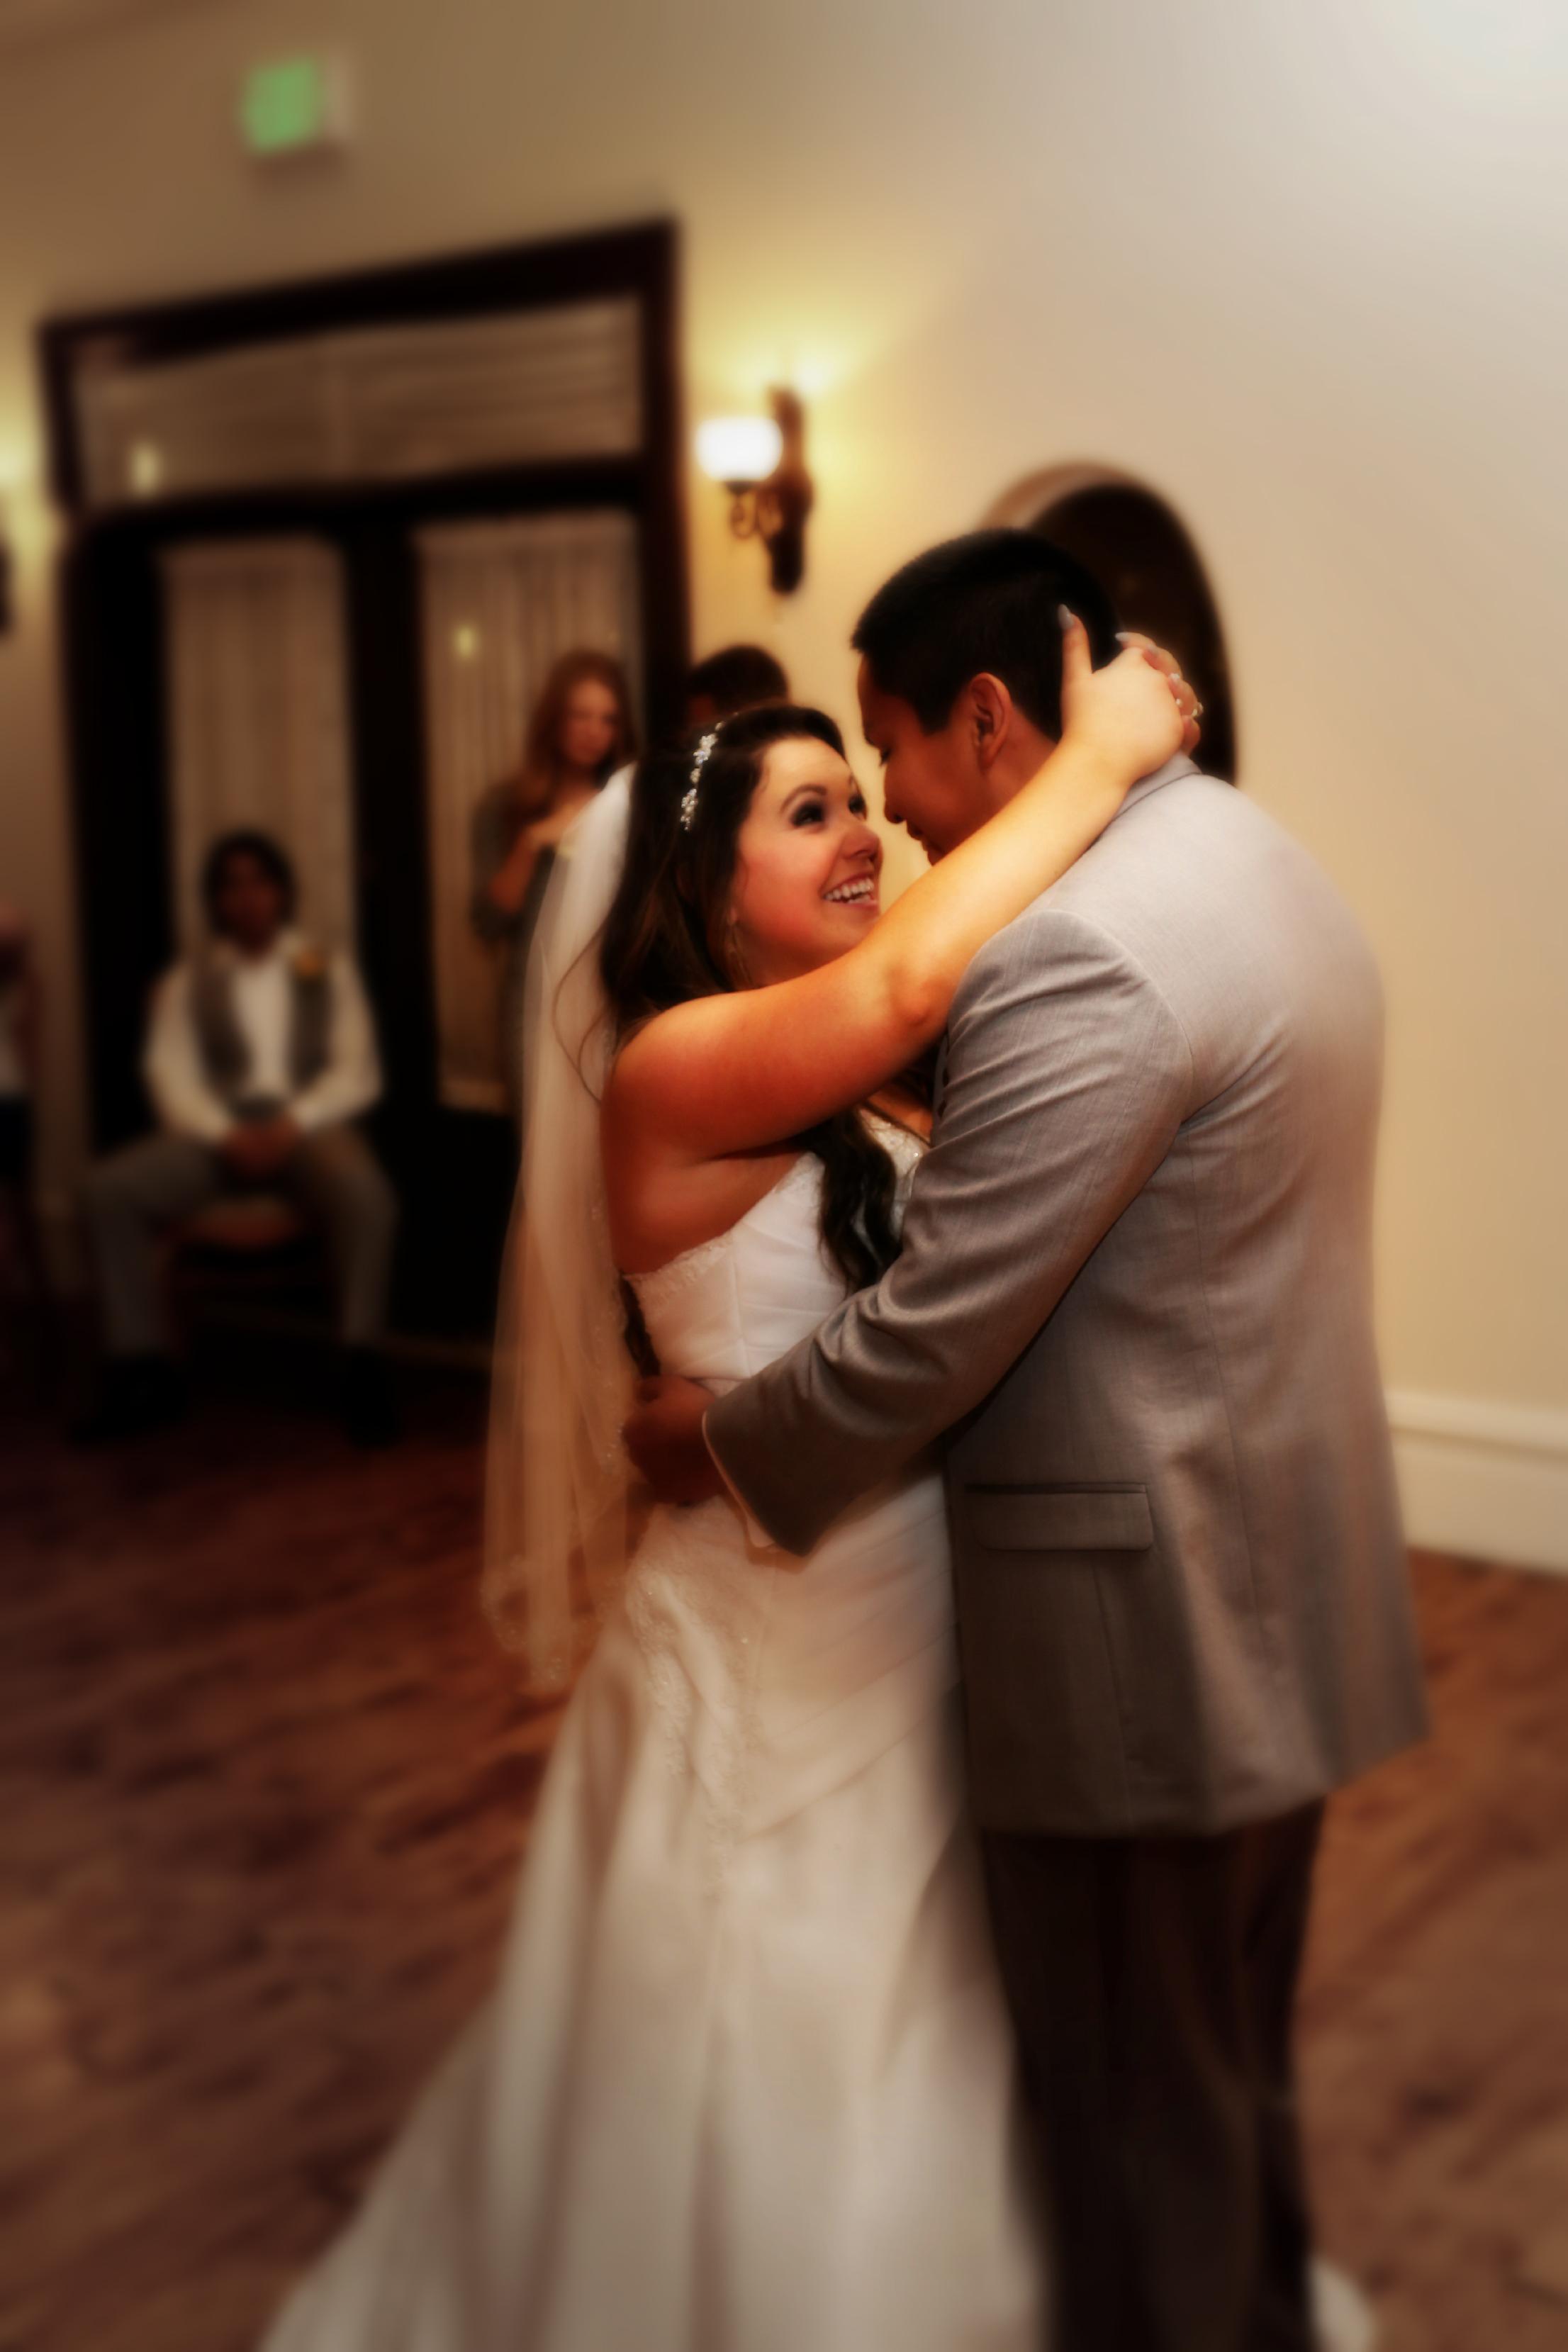 Bountiful wedding dance photography, by Kelly Loveless